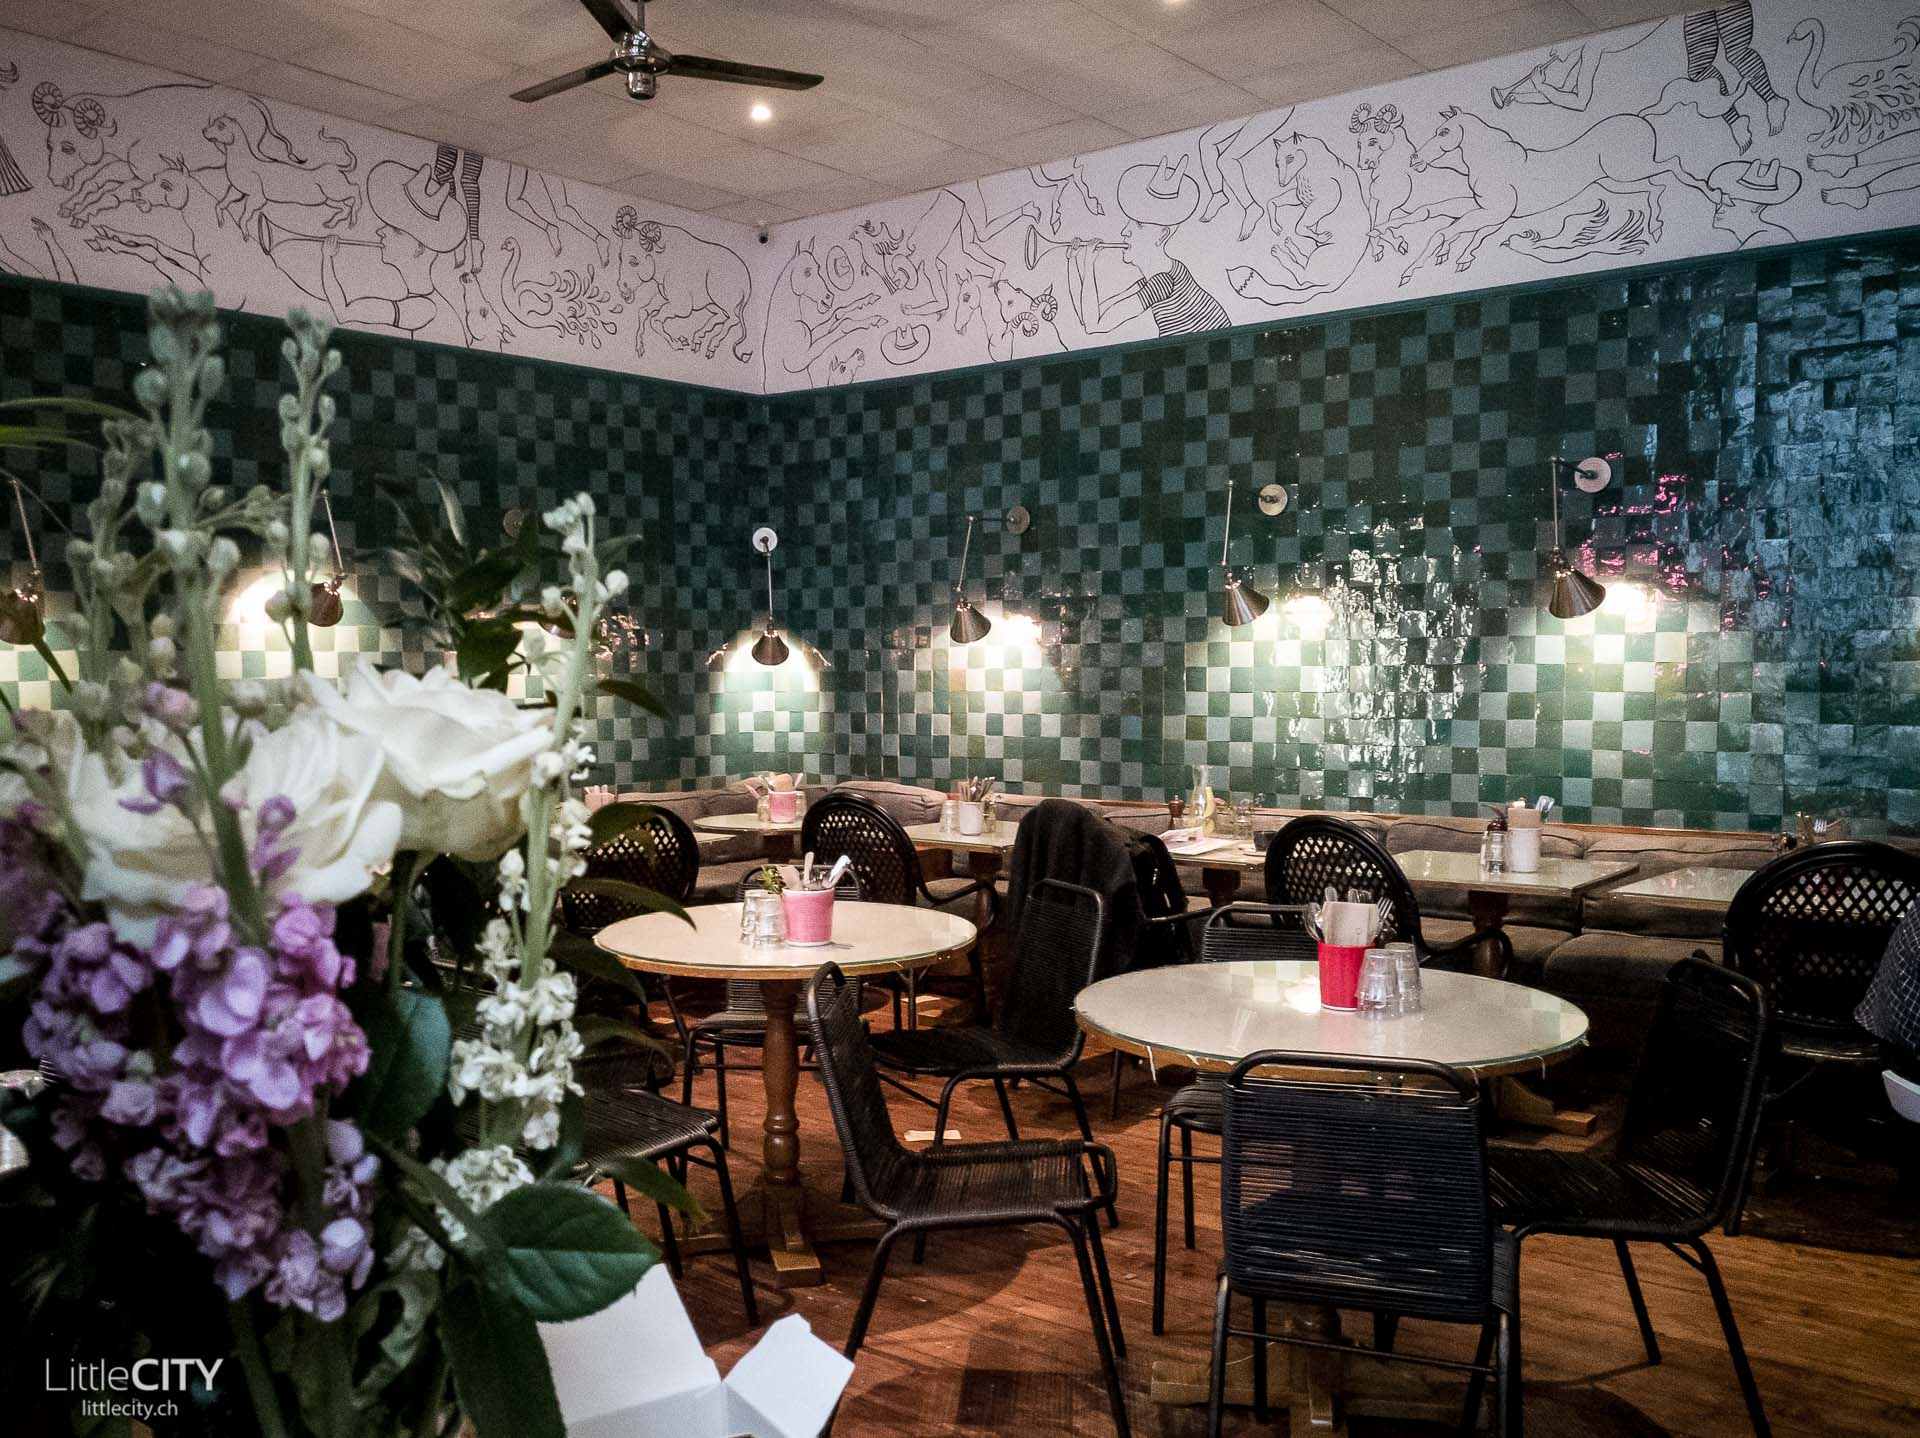 London Restauranttipp: The Farmer Girl Café in Notting Hill